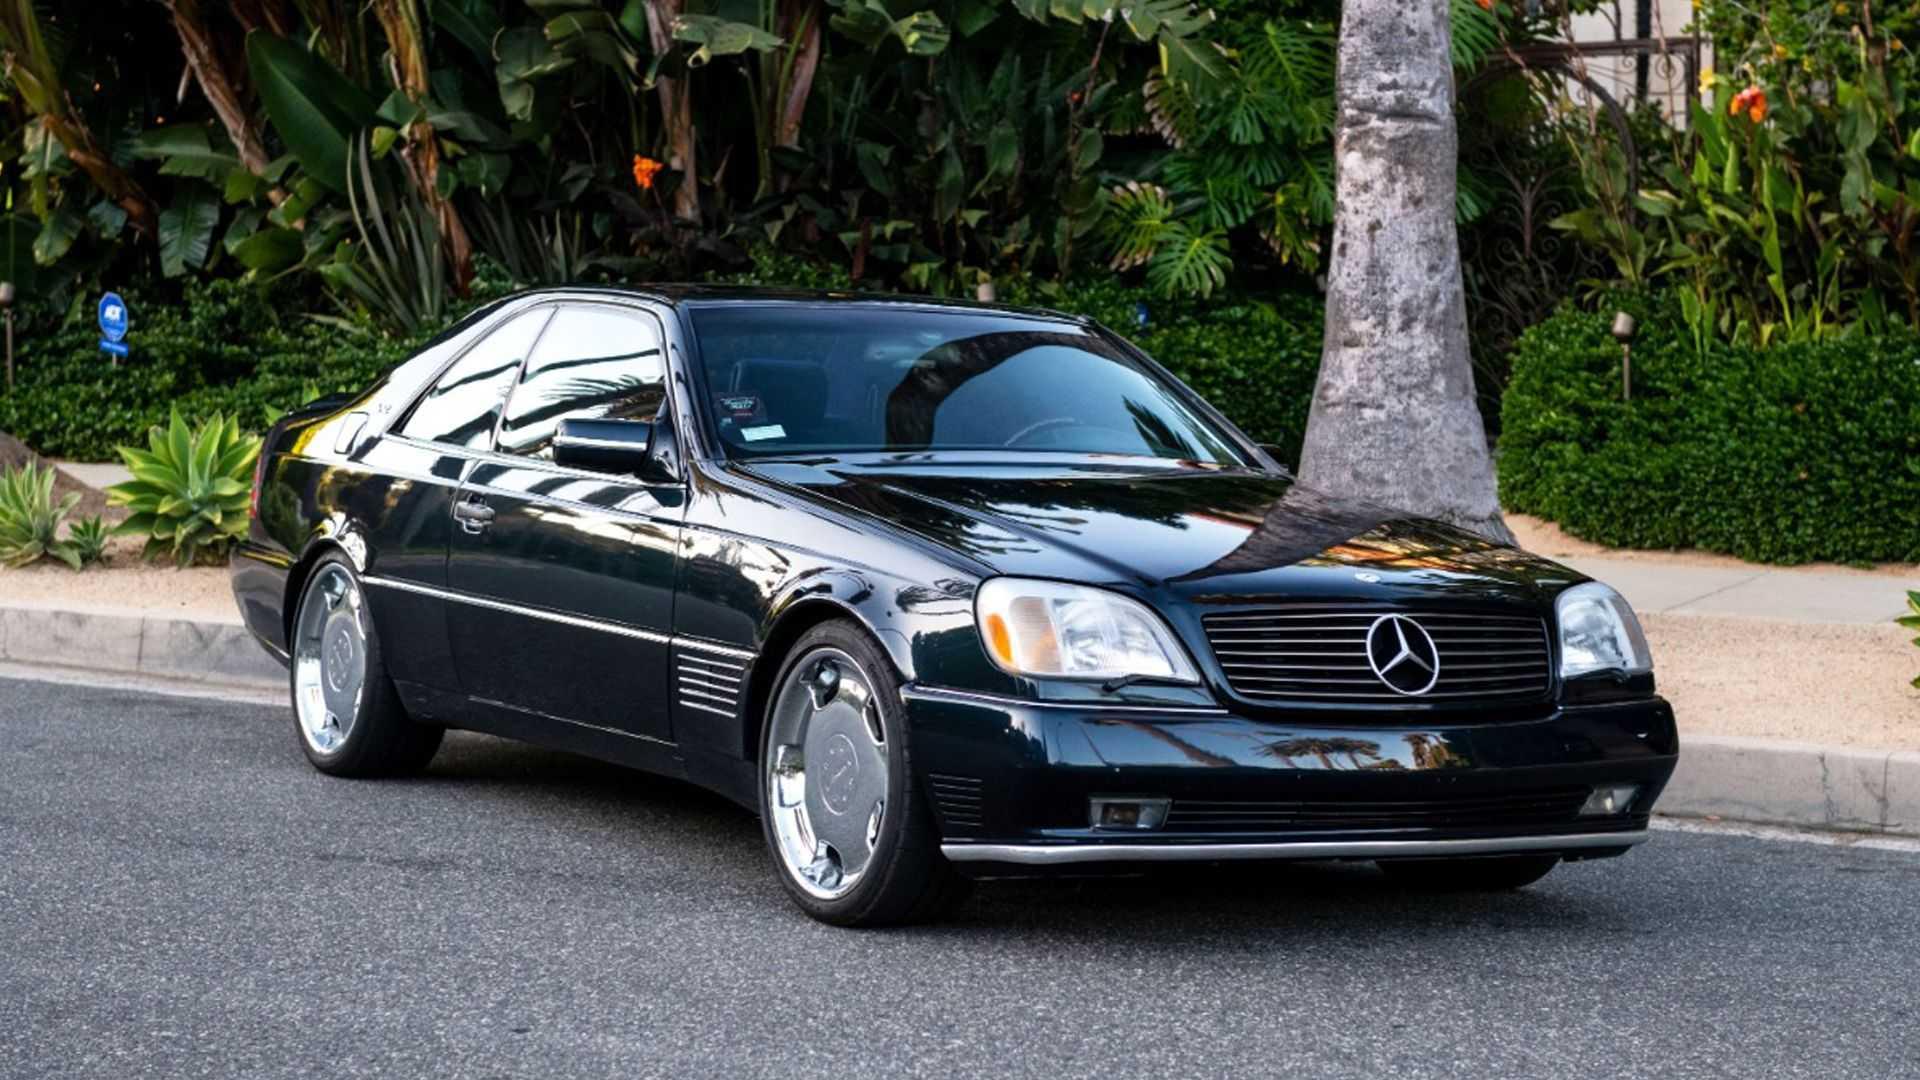 ¿Cuánto pagarías por el Mercedes S600 V12 Coupé que perteneció a Michael Jordan?